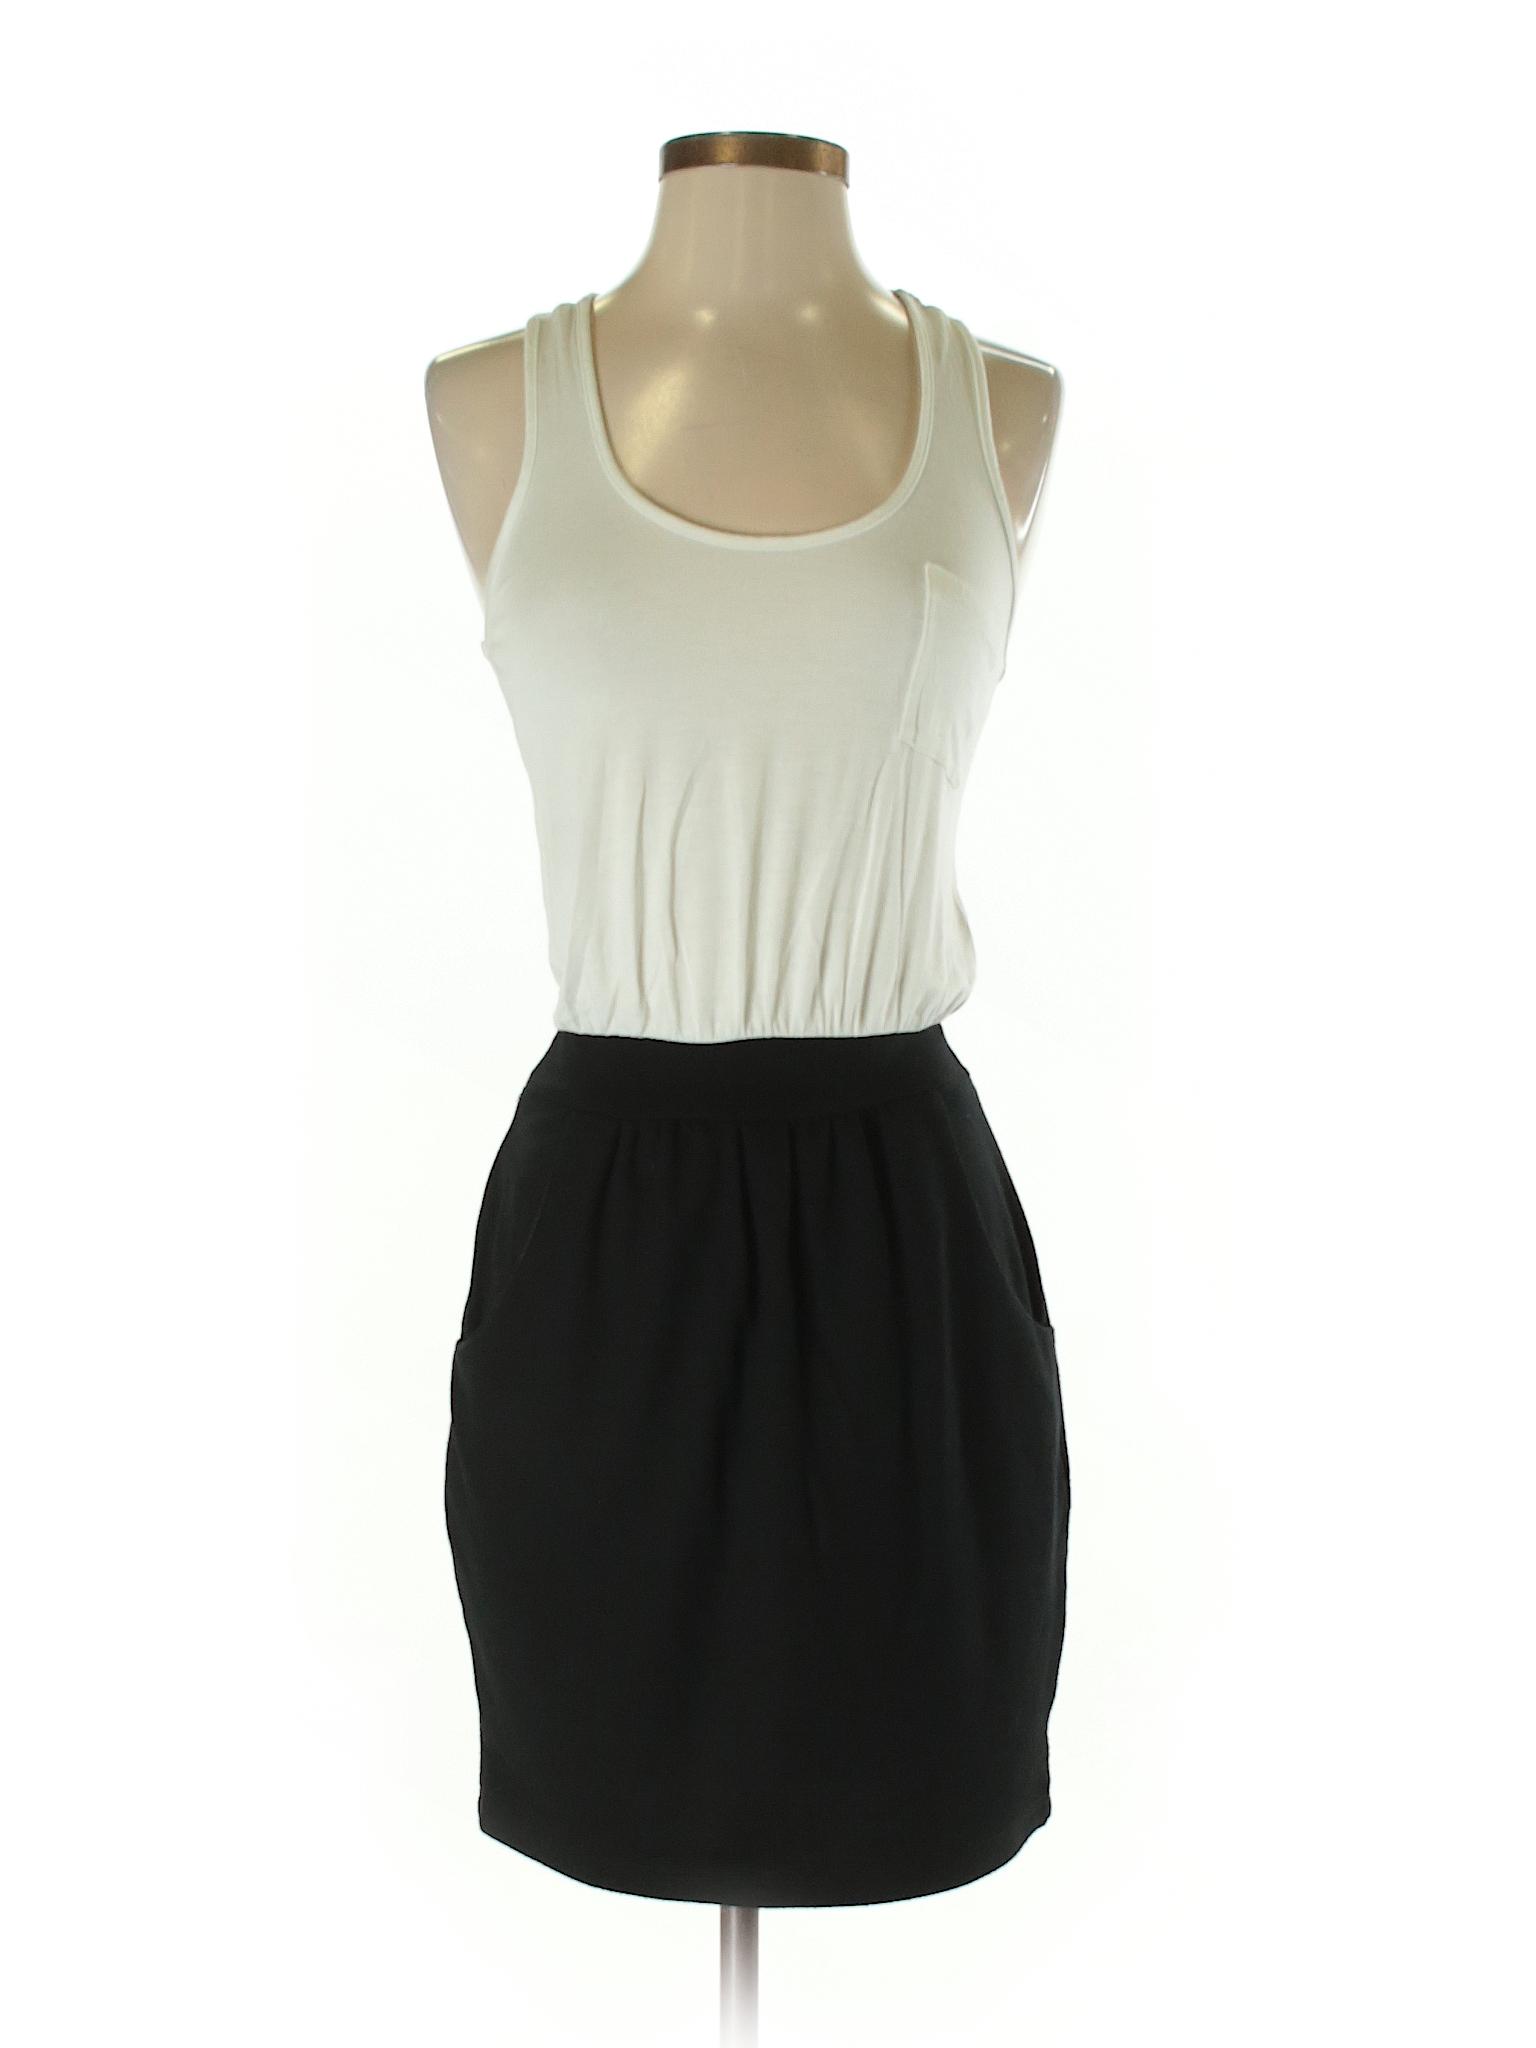 Selling Dress Soprano Casual Dress Selling Casual Soprano Dress Casual Selling Selling Soprano rw8q61nr